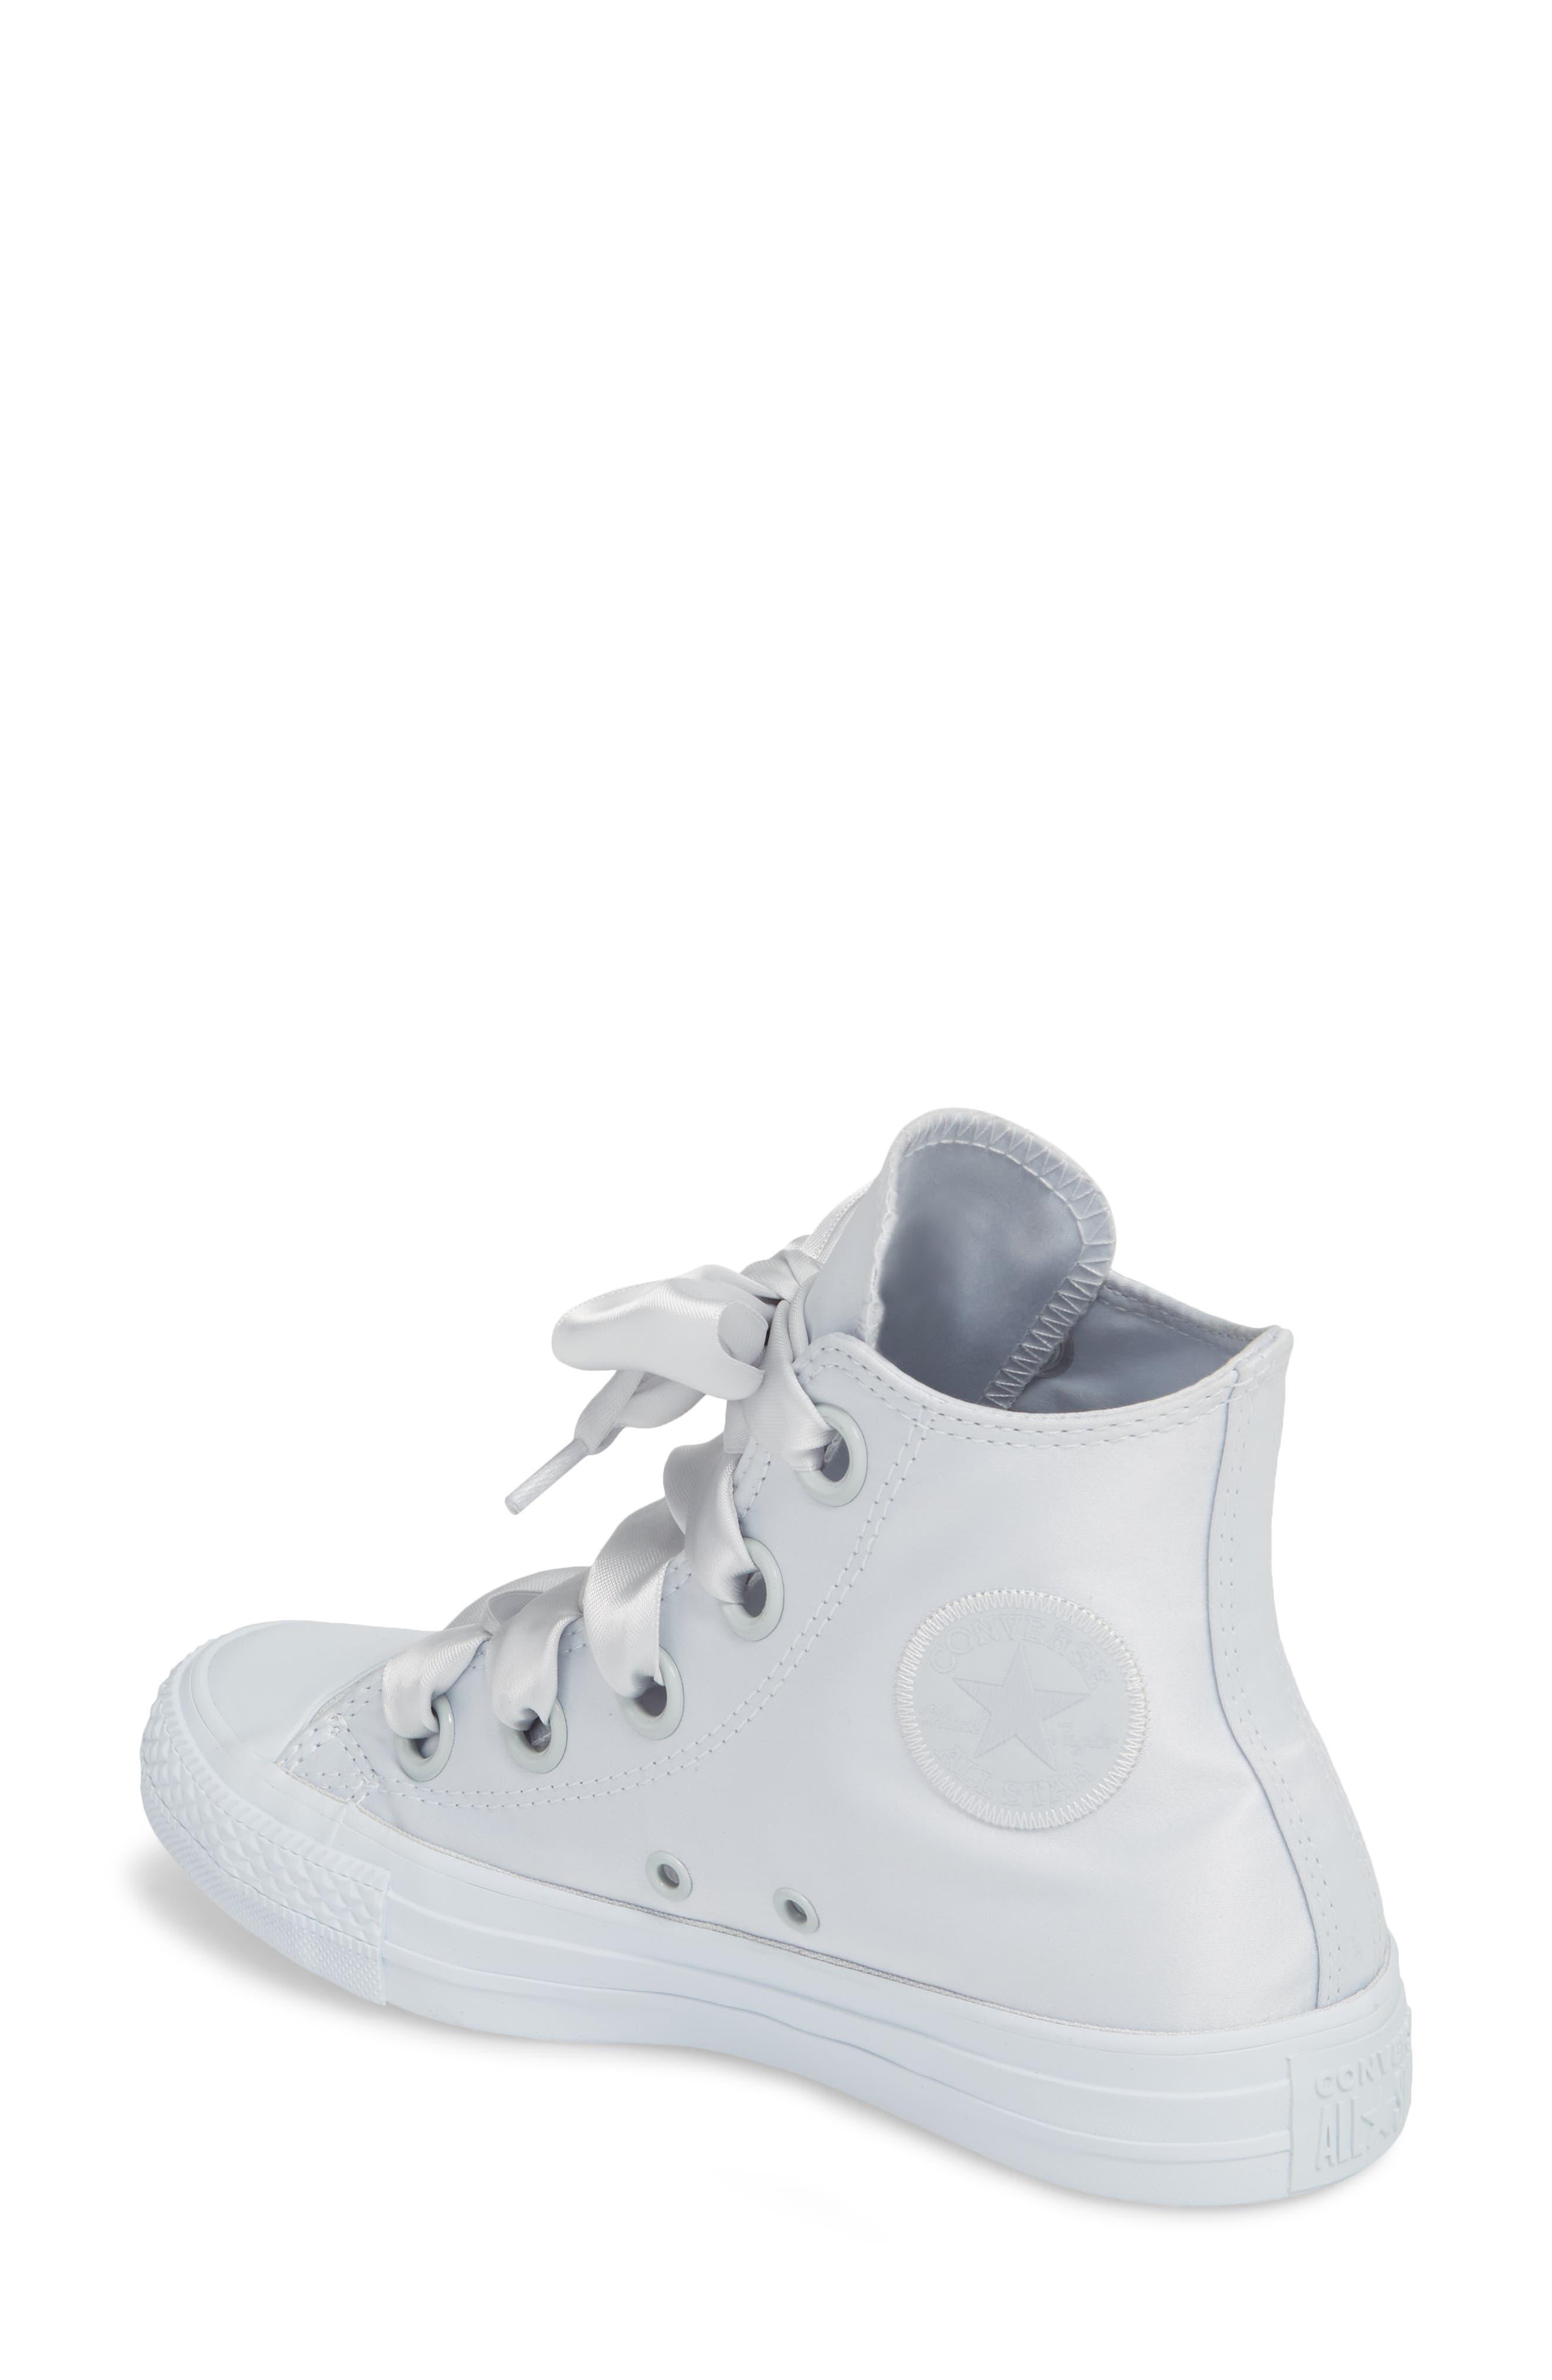 Chuck Taylor<sup>®</sup> All Star<sup>®</sup> Big Eyelet High Top Sneaker,                             Alternate thumbnail 2, color,                             Platinum